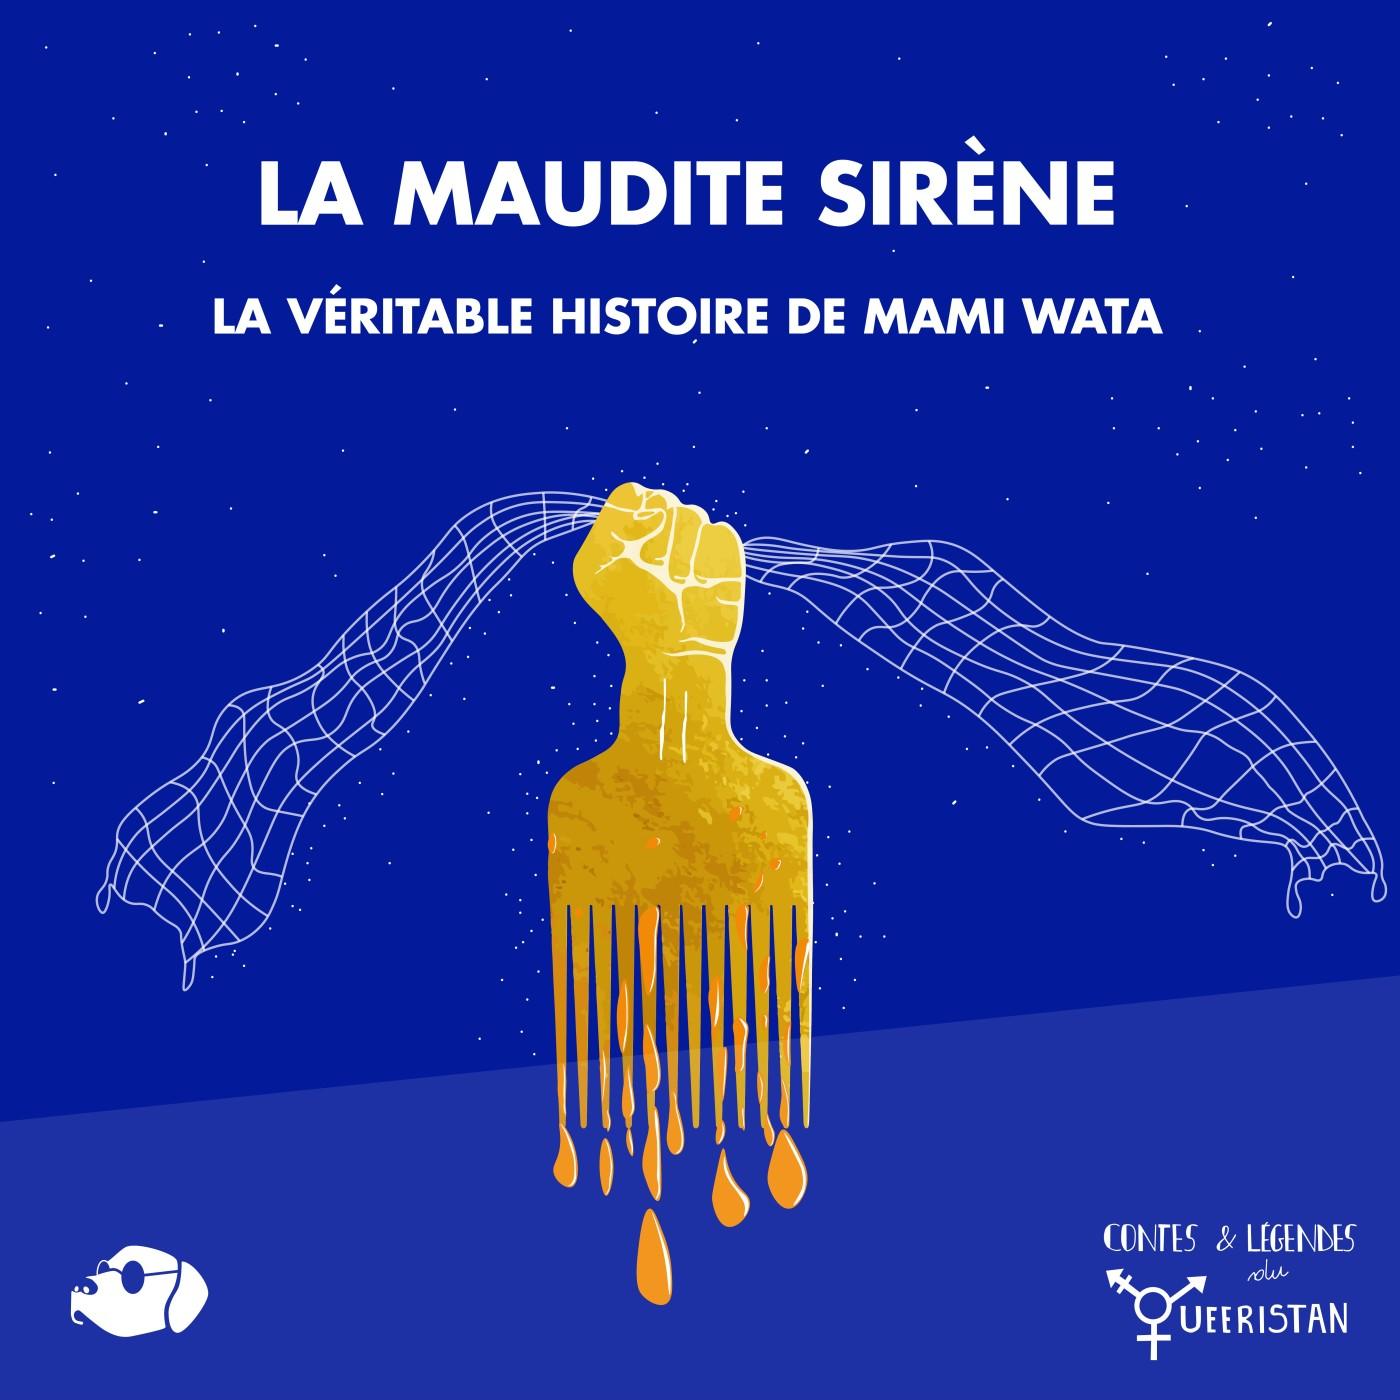 🥃La Maudite sirène : la véritable histoire de Mami Wata